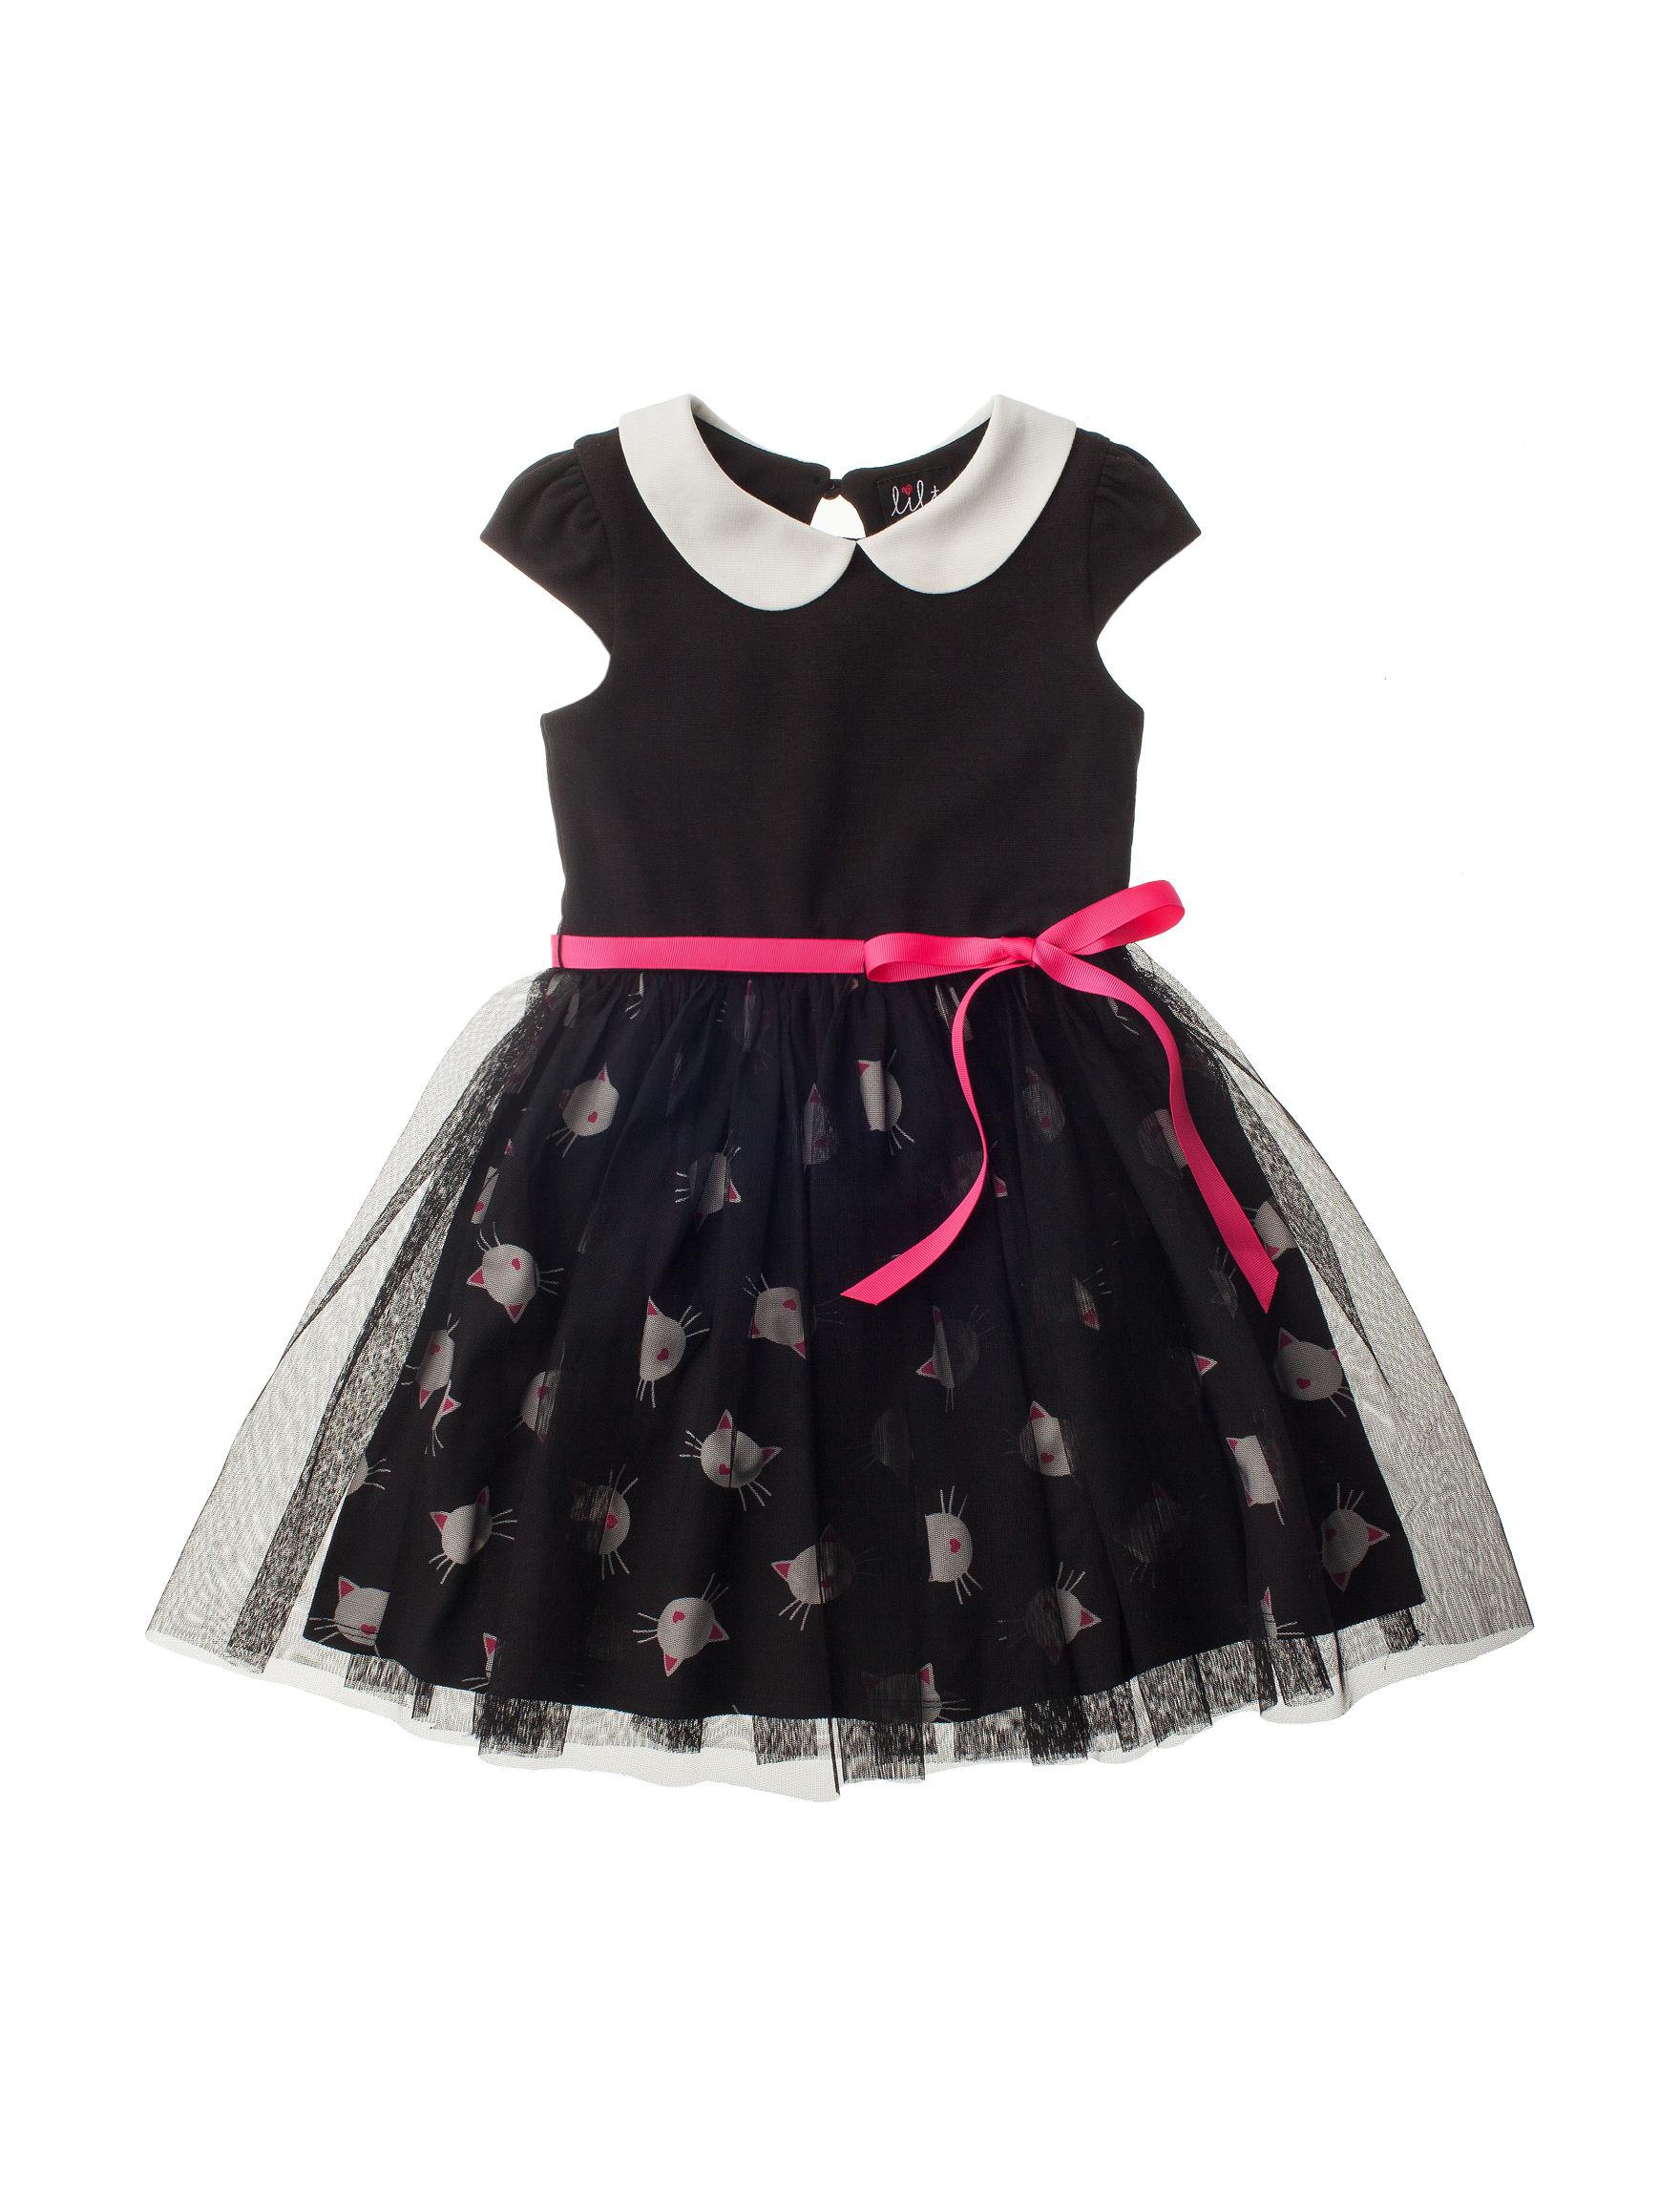 Pinky Black